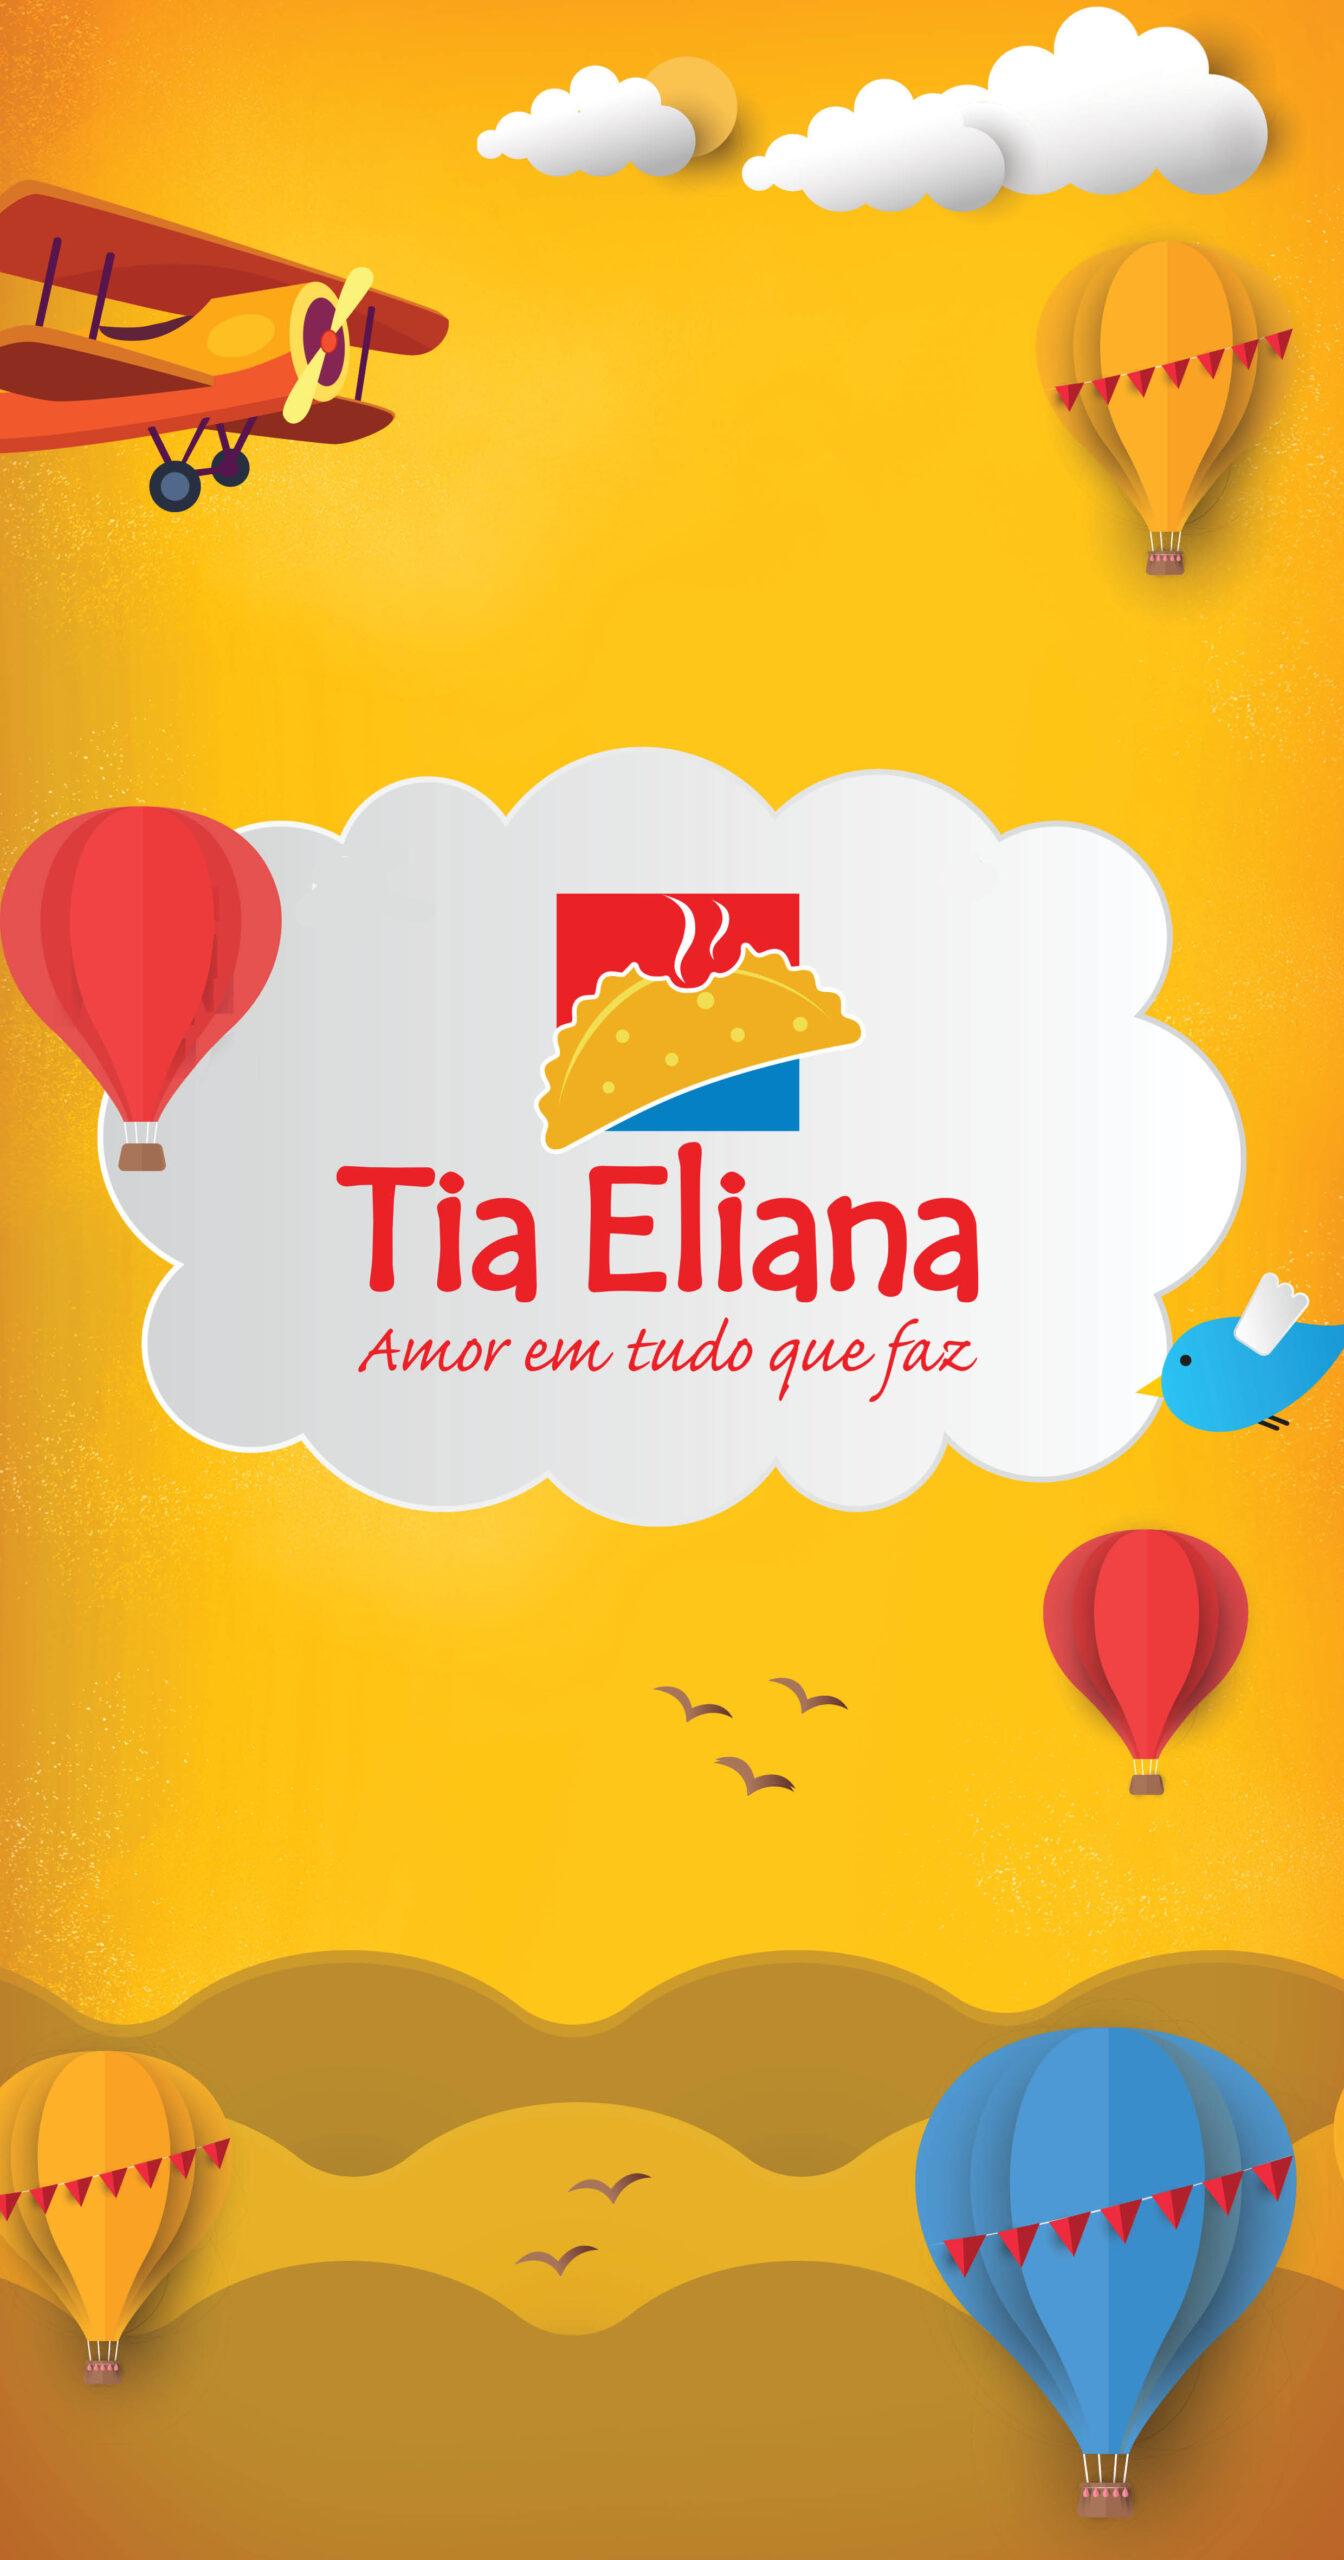 cardapio_encomendas_40x21cm_tia_eliana_interior_caete2-scaled Encomendas - Itabira - JP